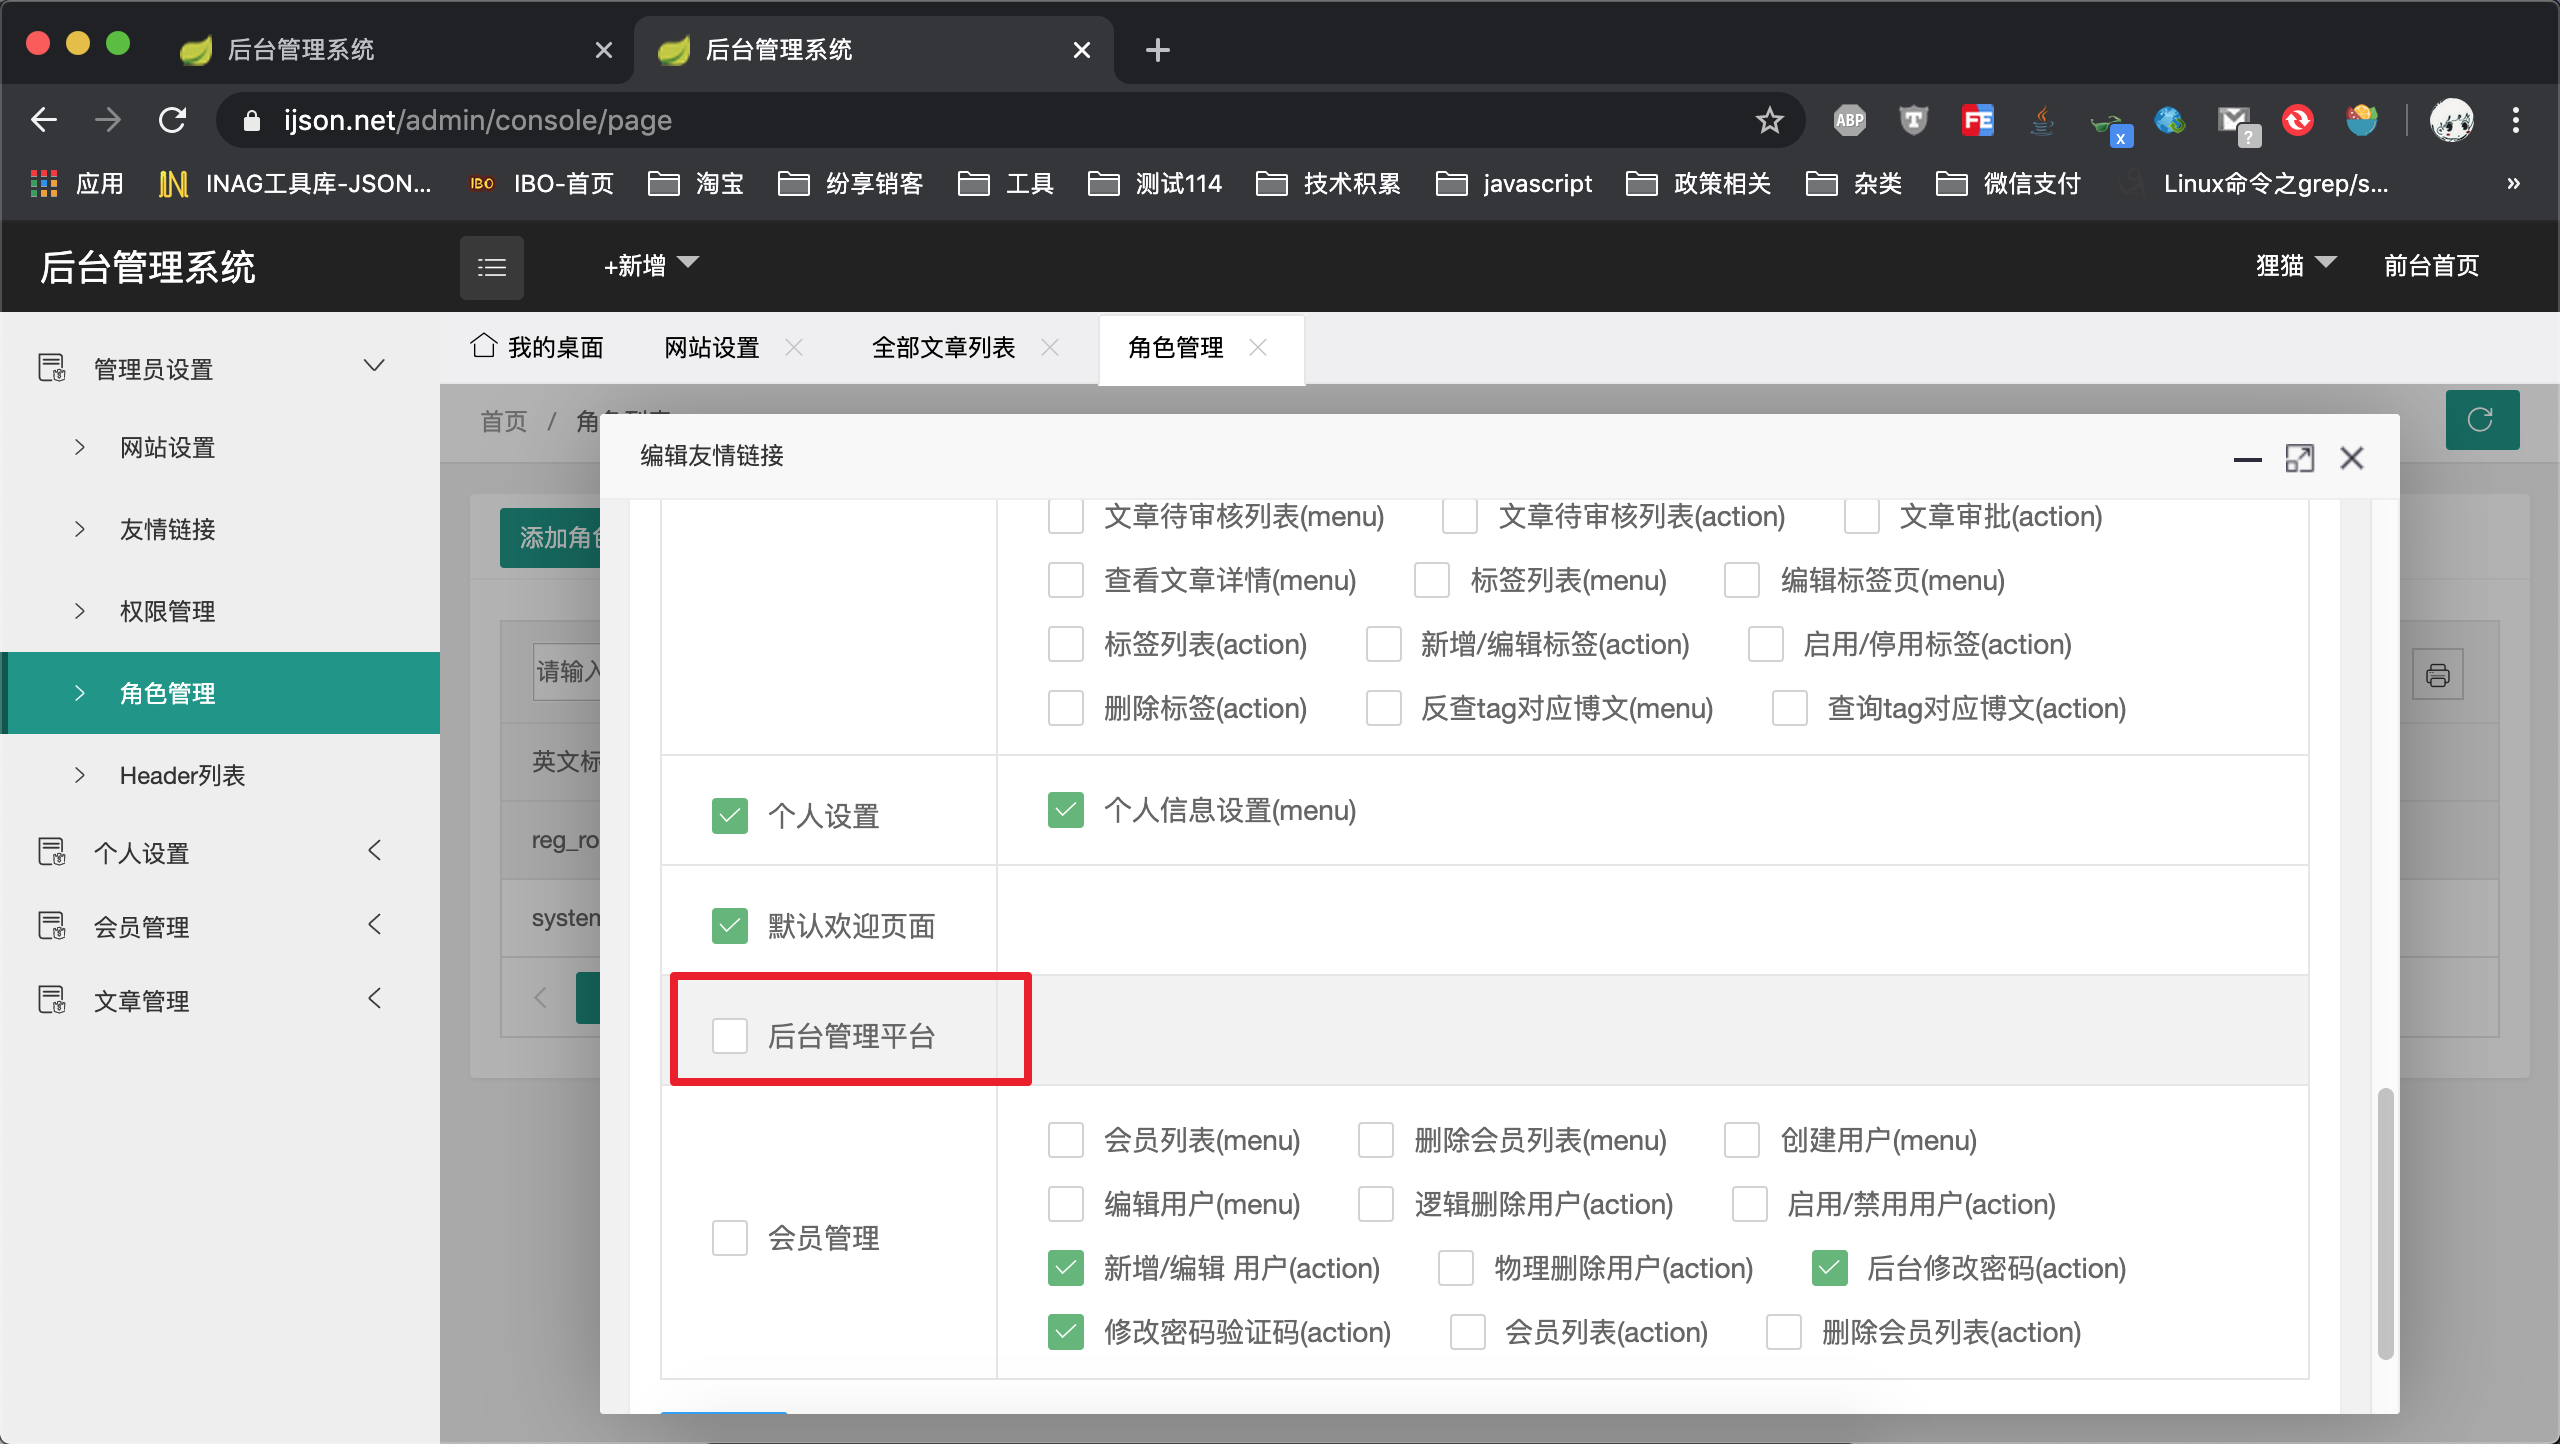 IBO 1.1.*+ 版本服务安装与使用